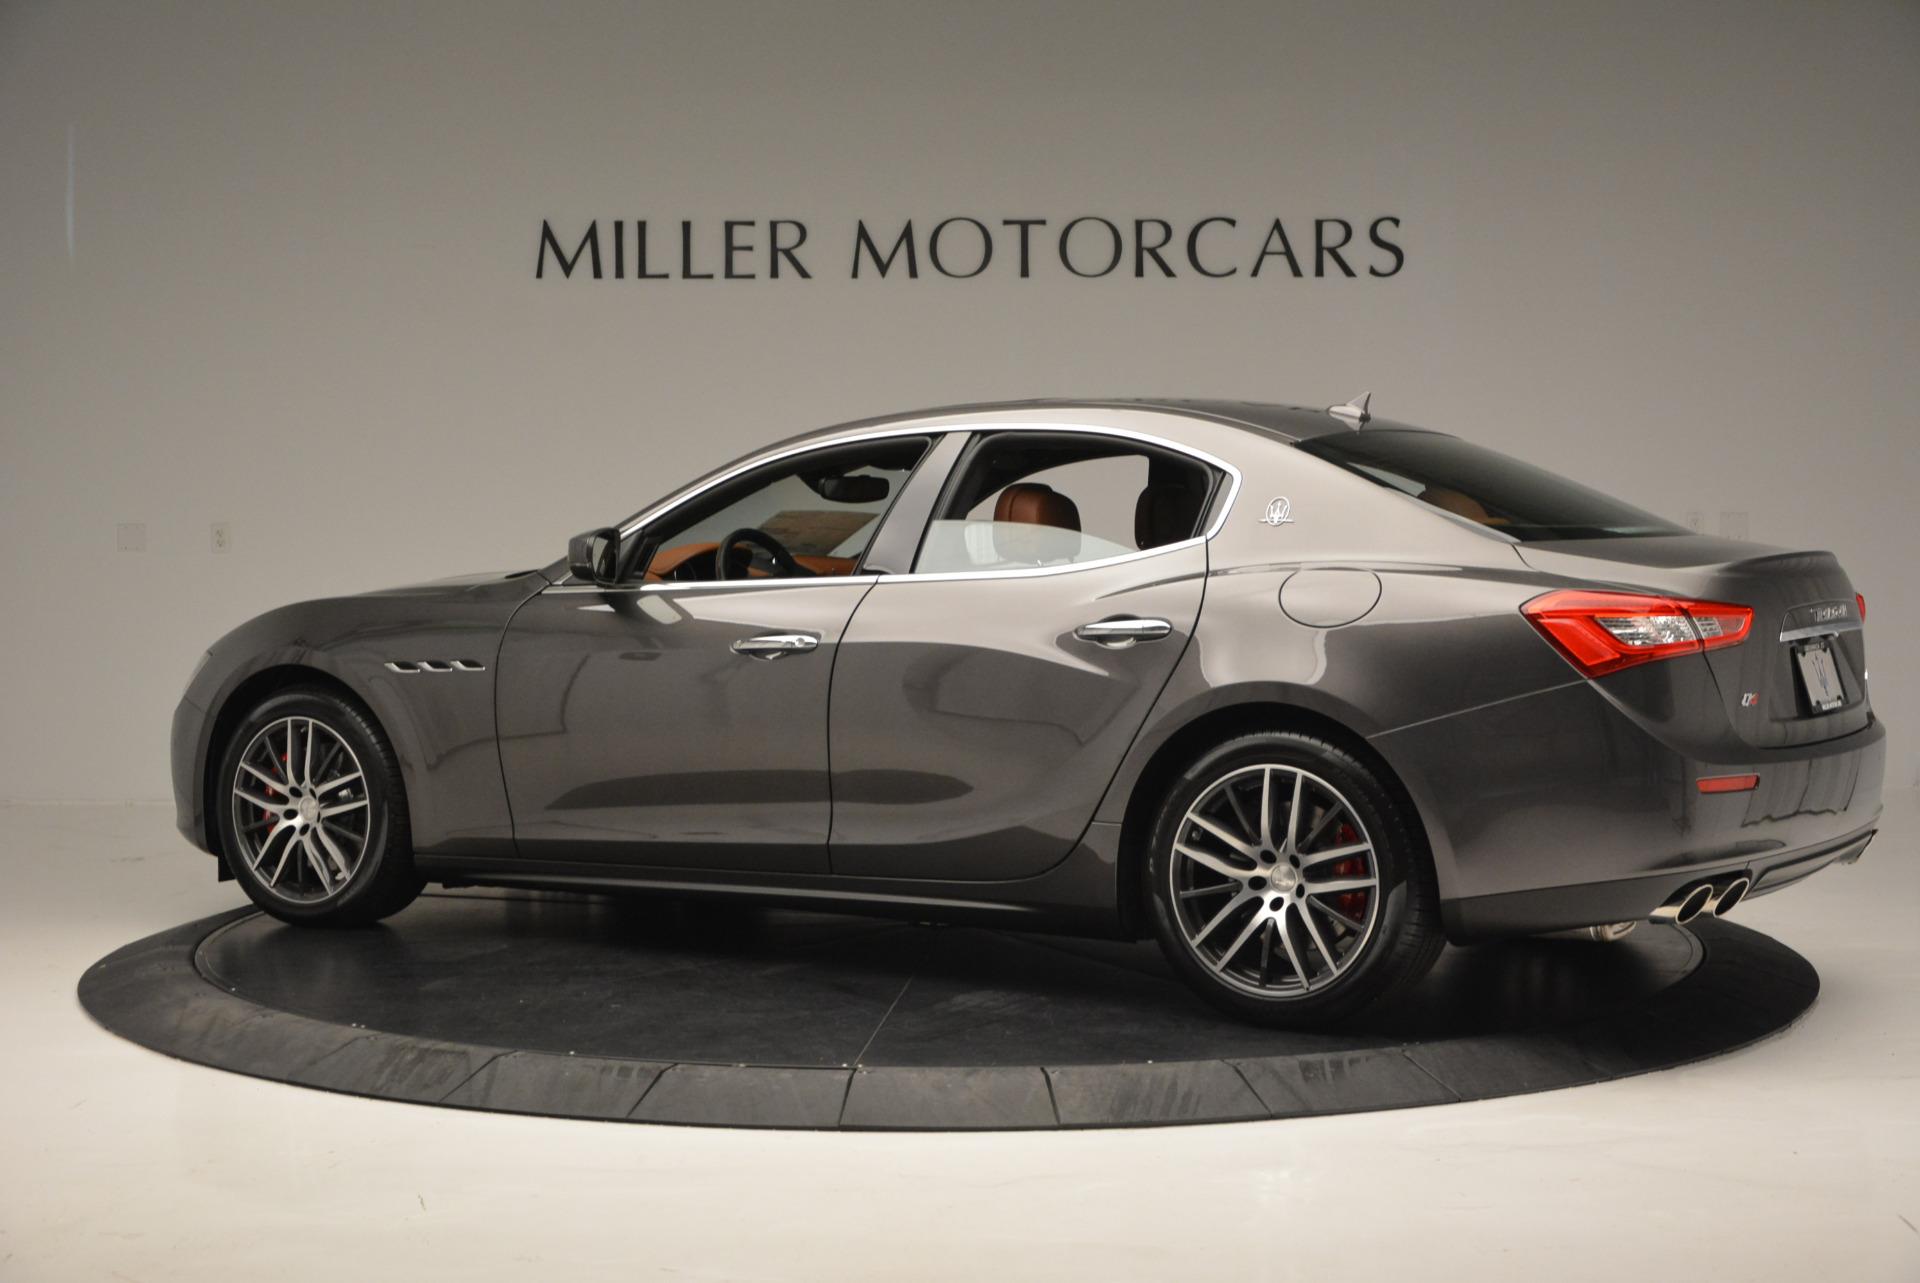 Used 2017 Maserati Ghibli S Q4  EX-LOANER For Sale In Greenwich, CT. Alfa Romeo of Greenwich, W311 565_p4